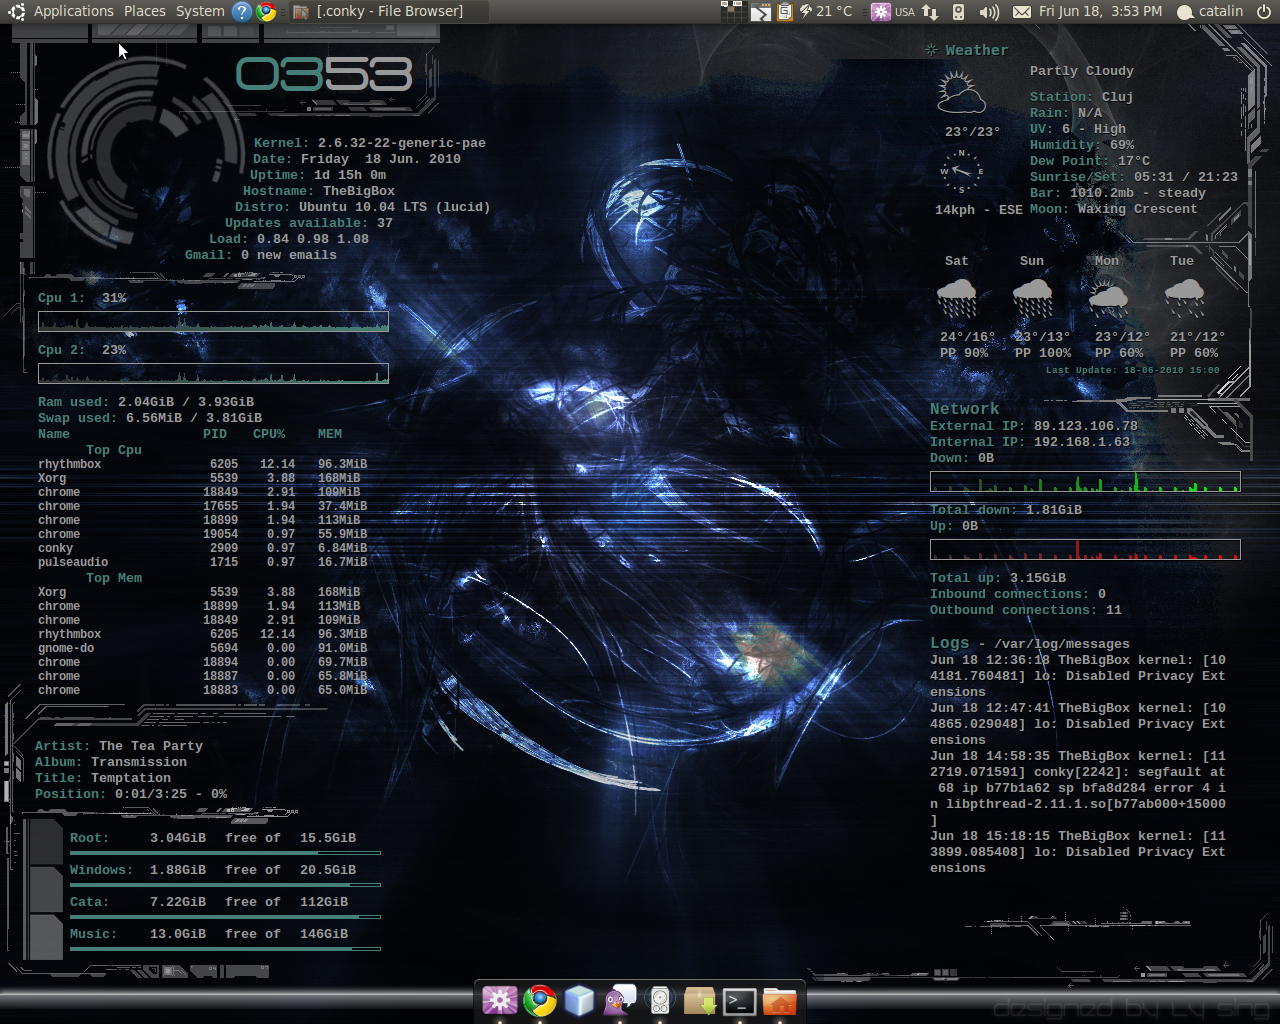 Conky empowered desktop